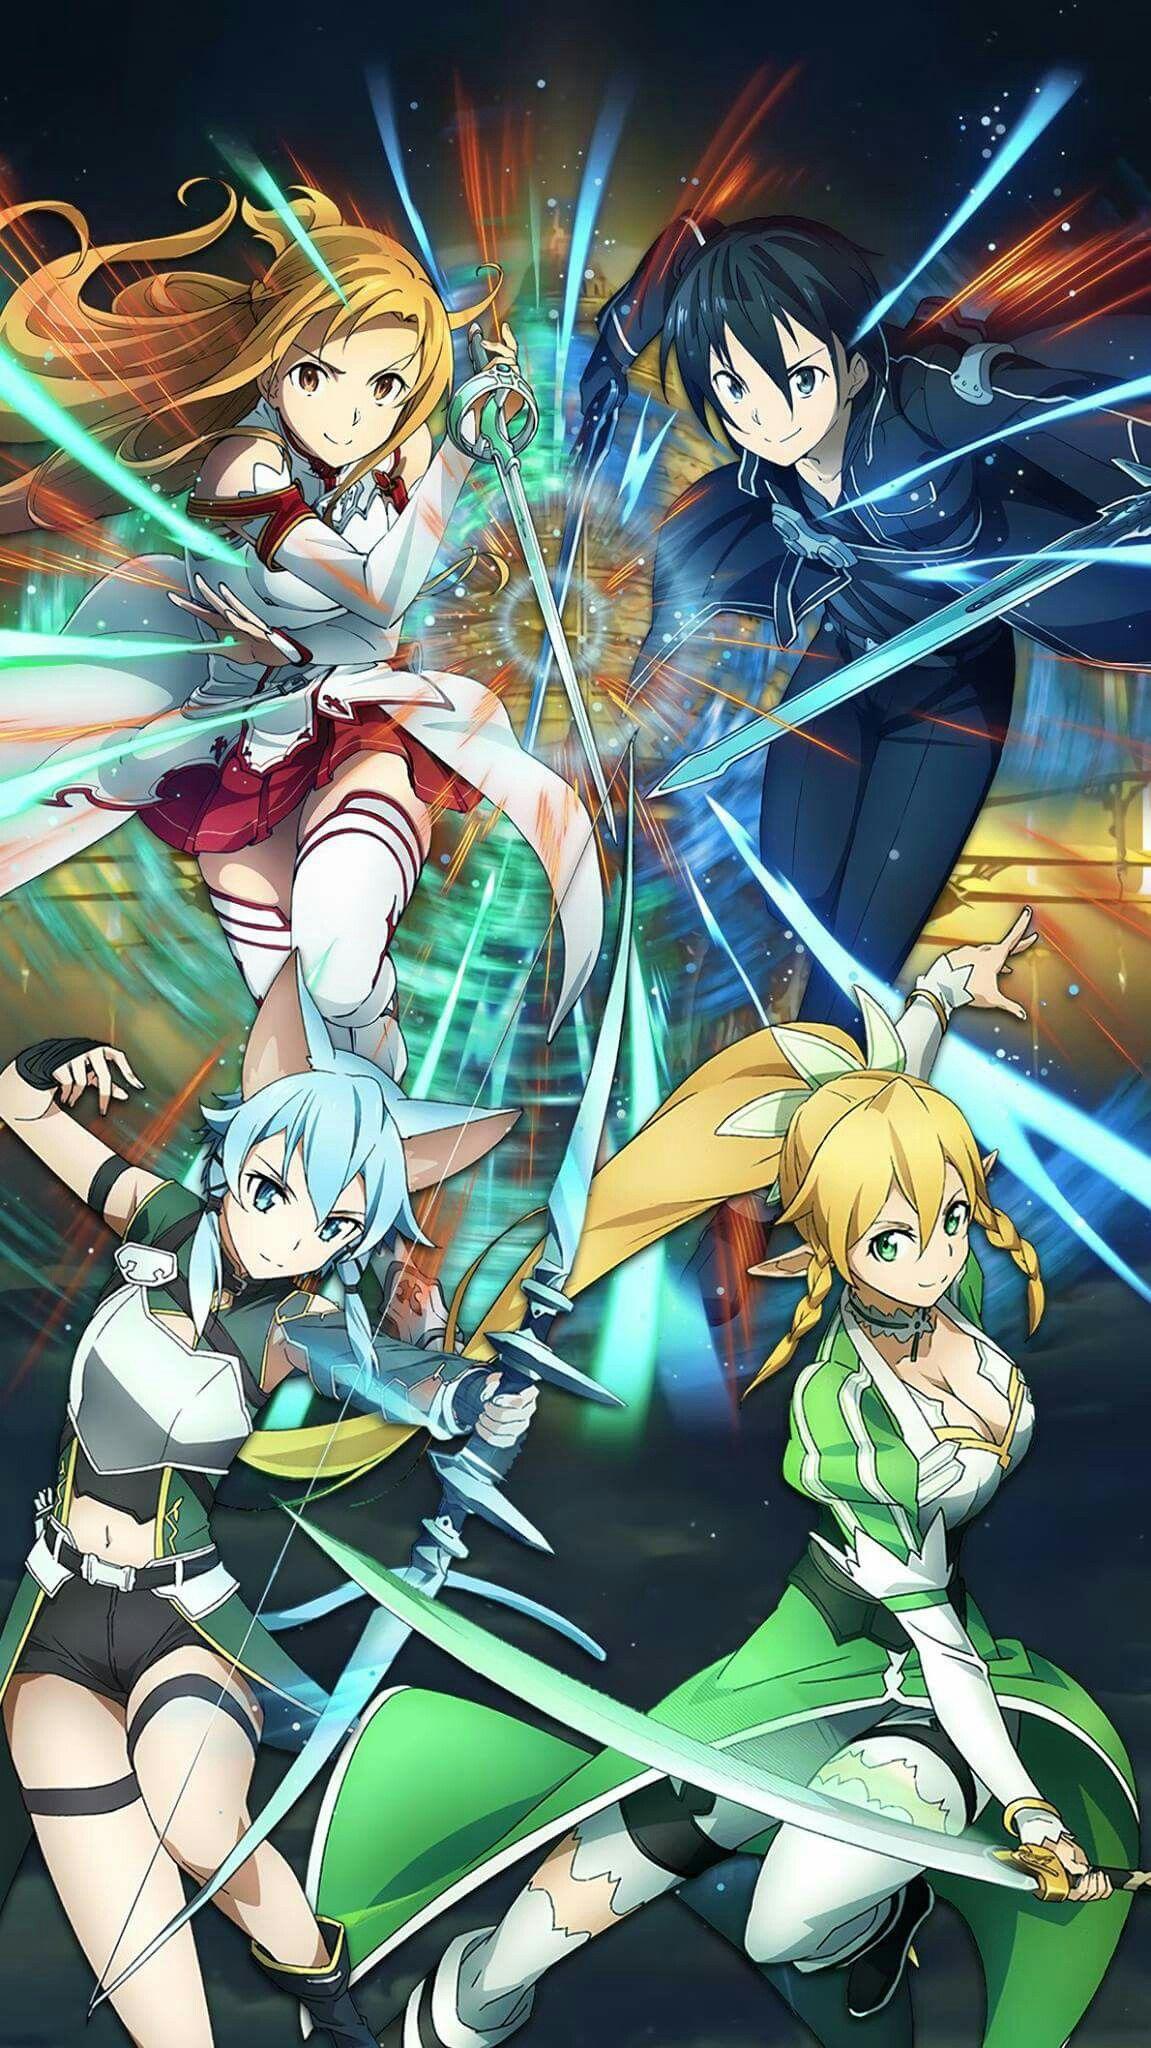 Dress up games favourites by asuna and kirito on deviantart - Anniversary Banner Mobile Wallpaper Sao Md By Kaz Kirigiri